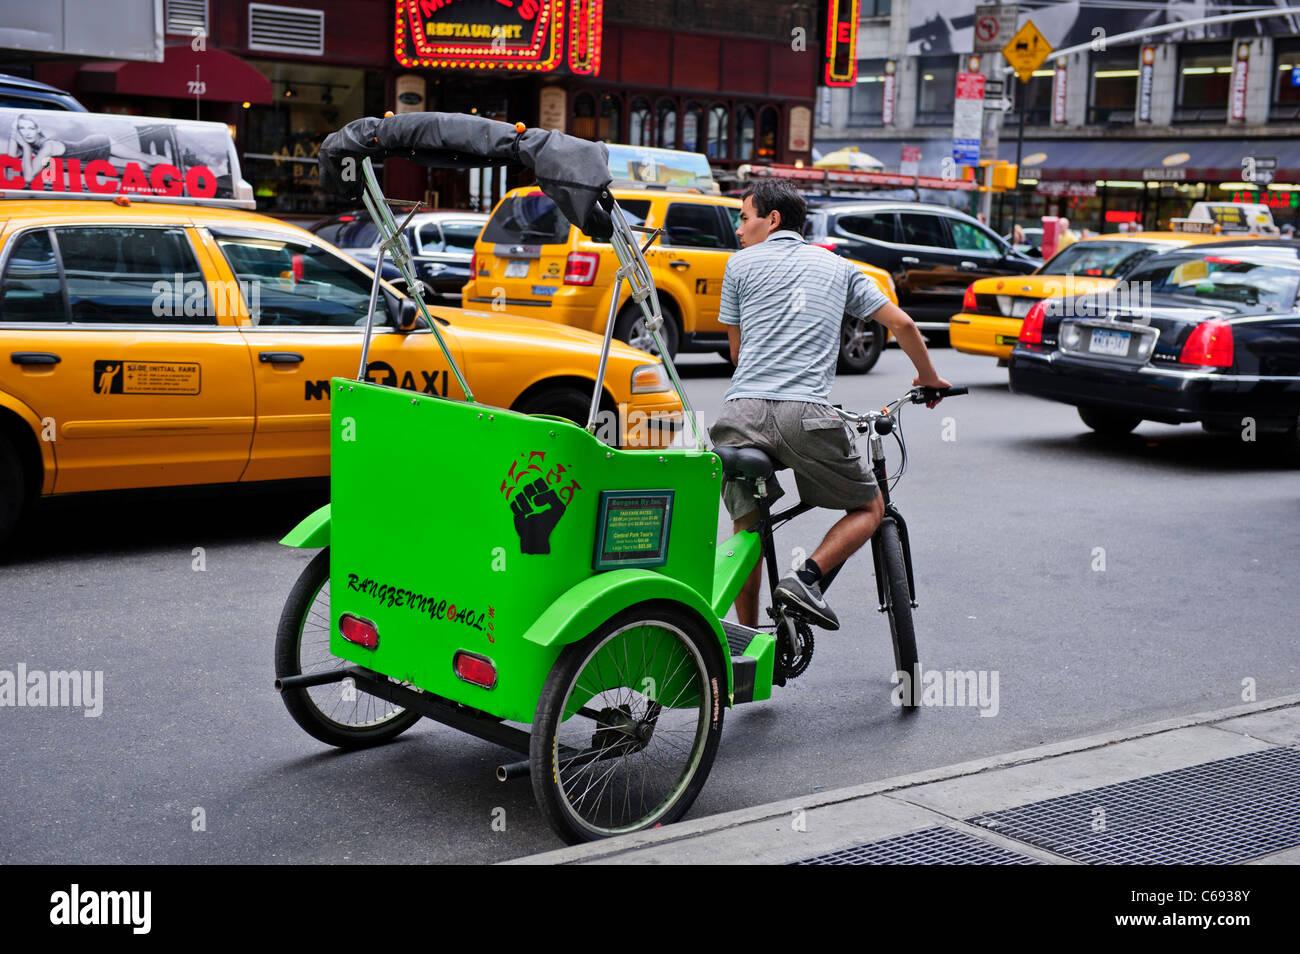 Rickshaw, Times Square, New York City, USA. - Stock Image